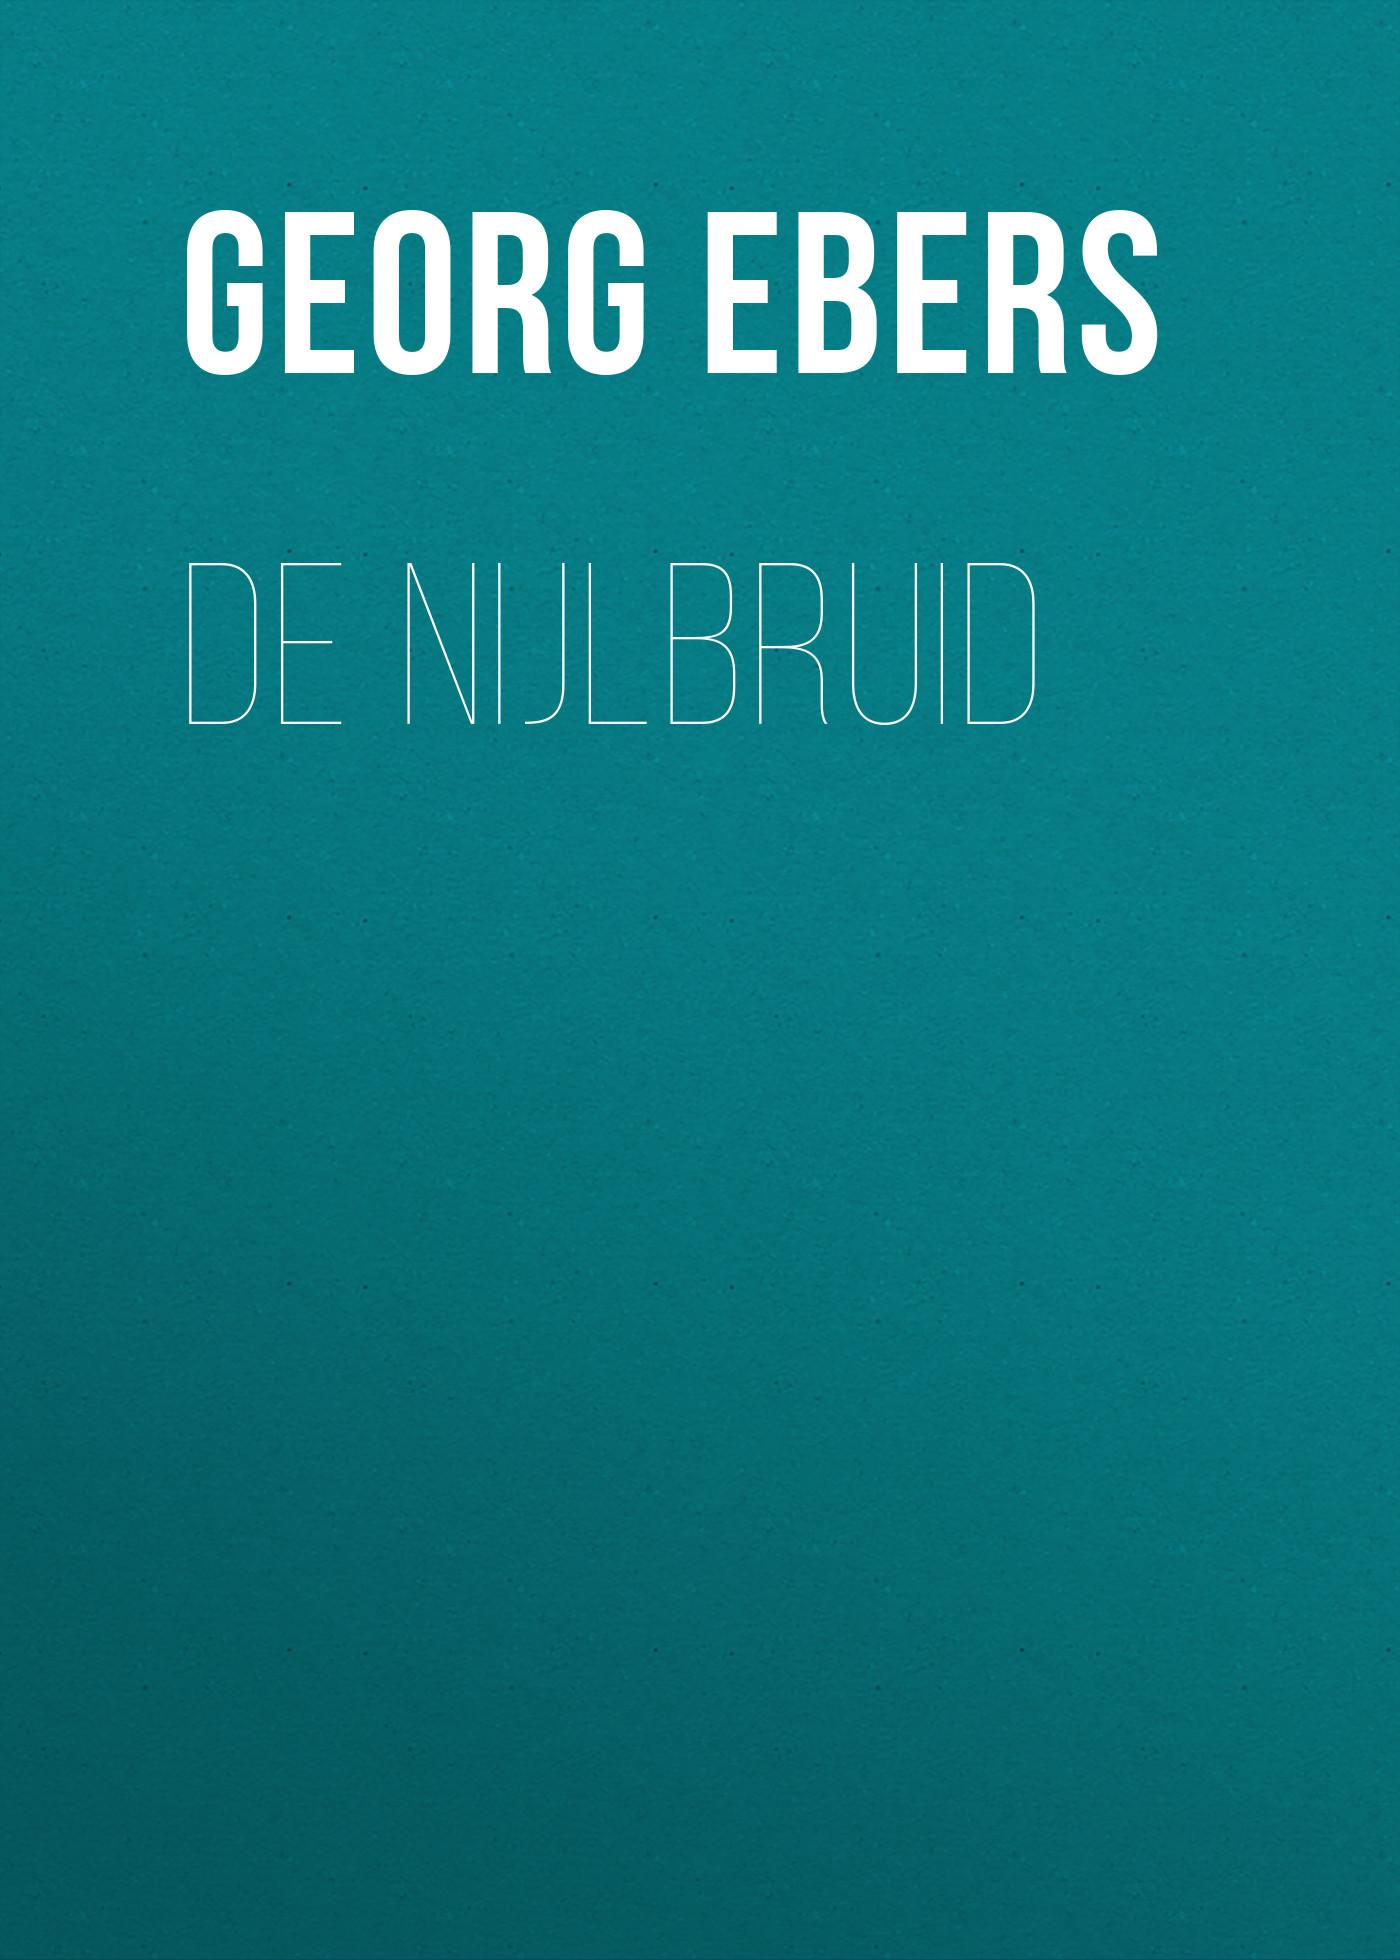 Georg Ebers De nijlbruid georg ebers antike portraits die hellenistischen bildnisse aus dem fajjum